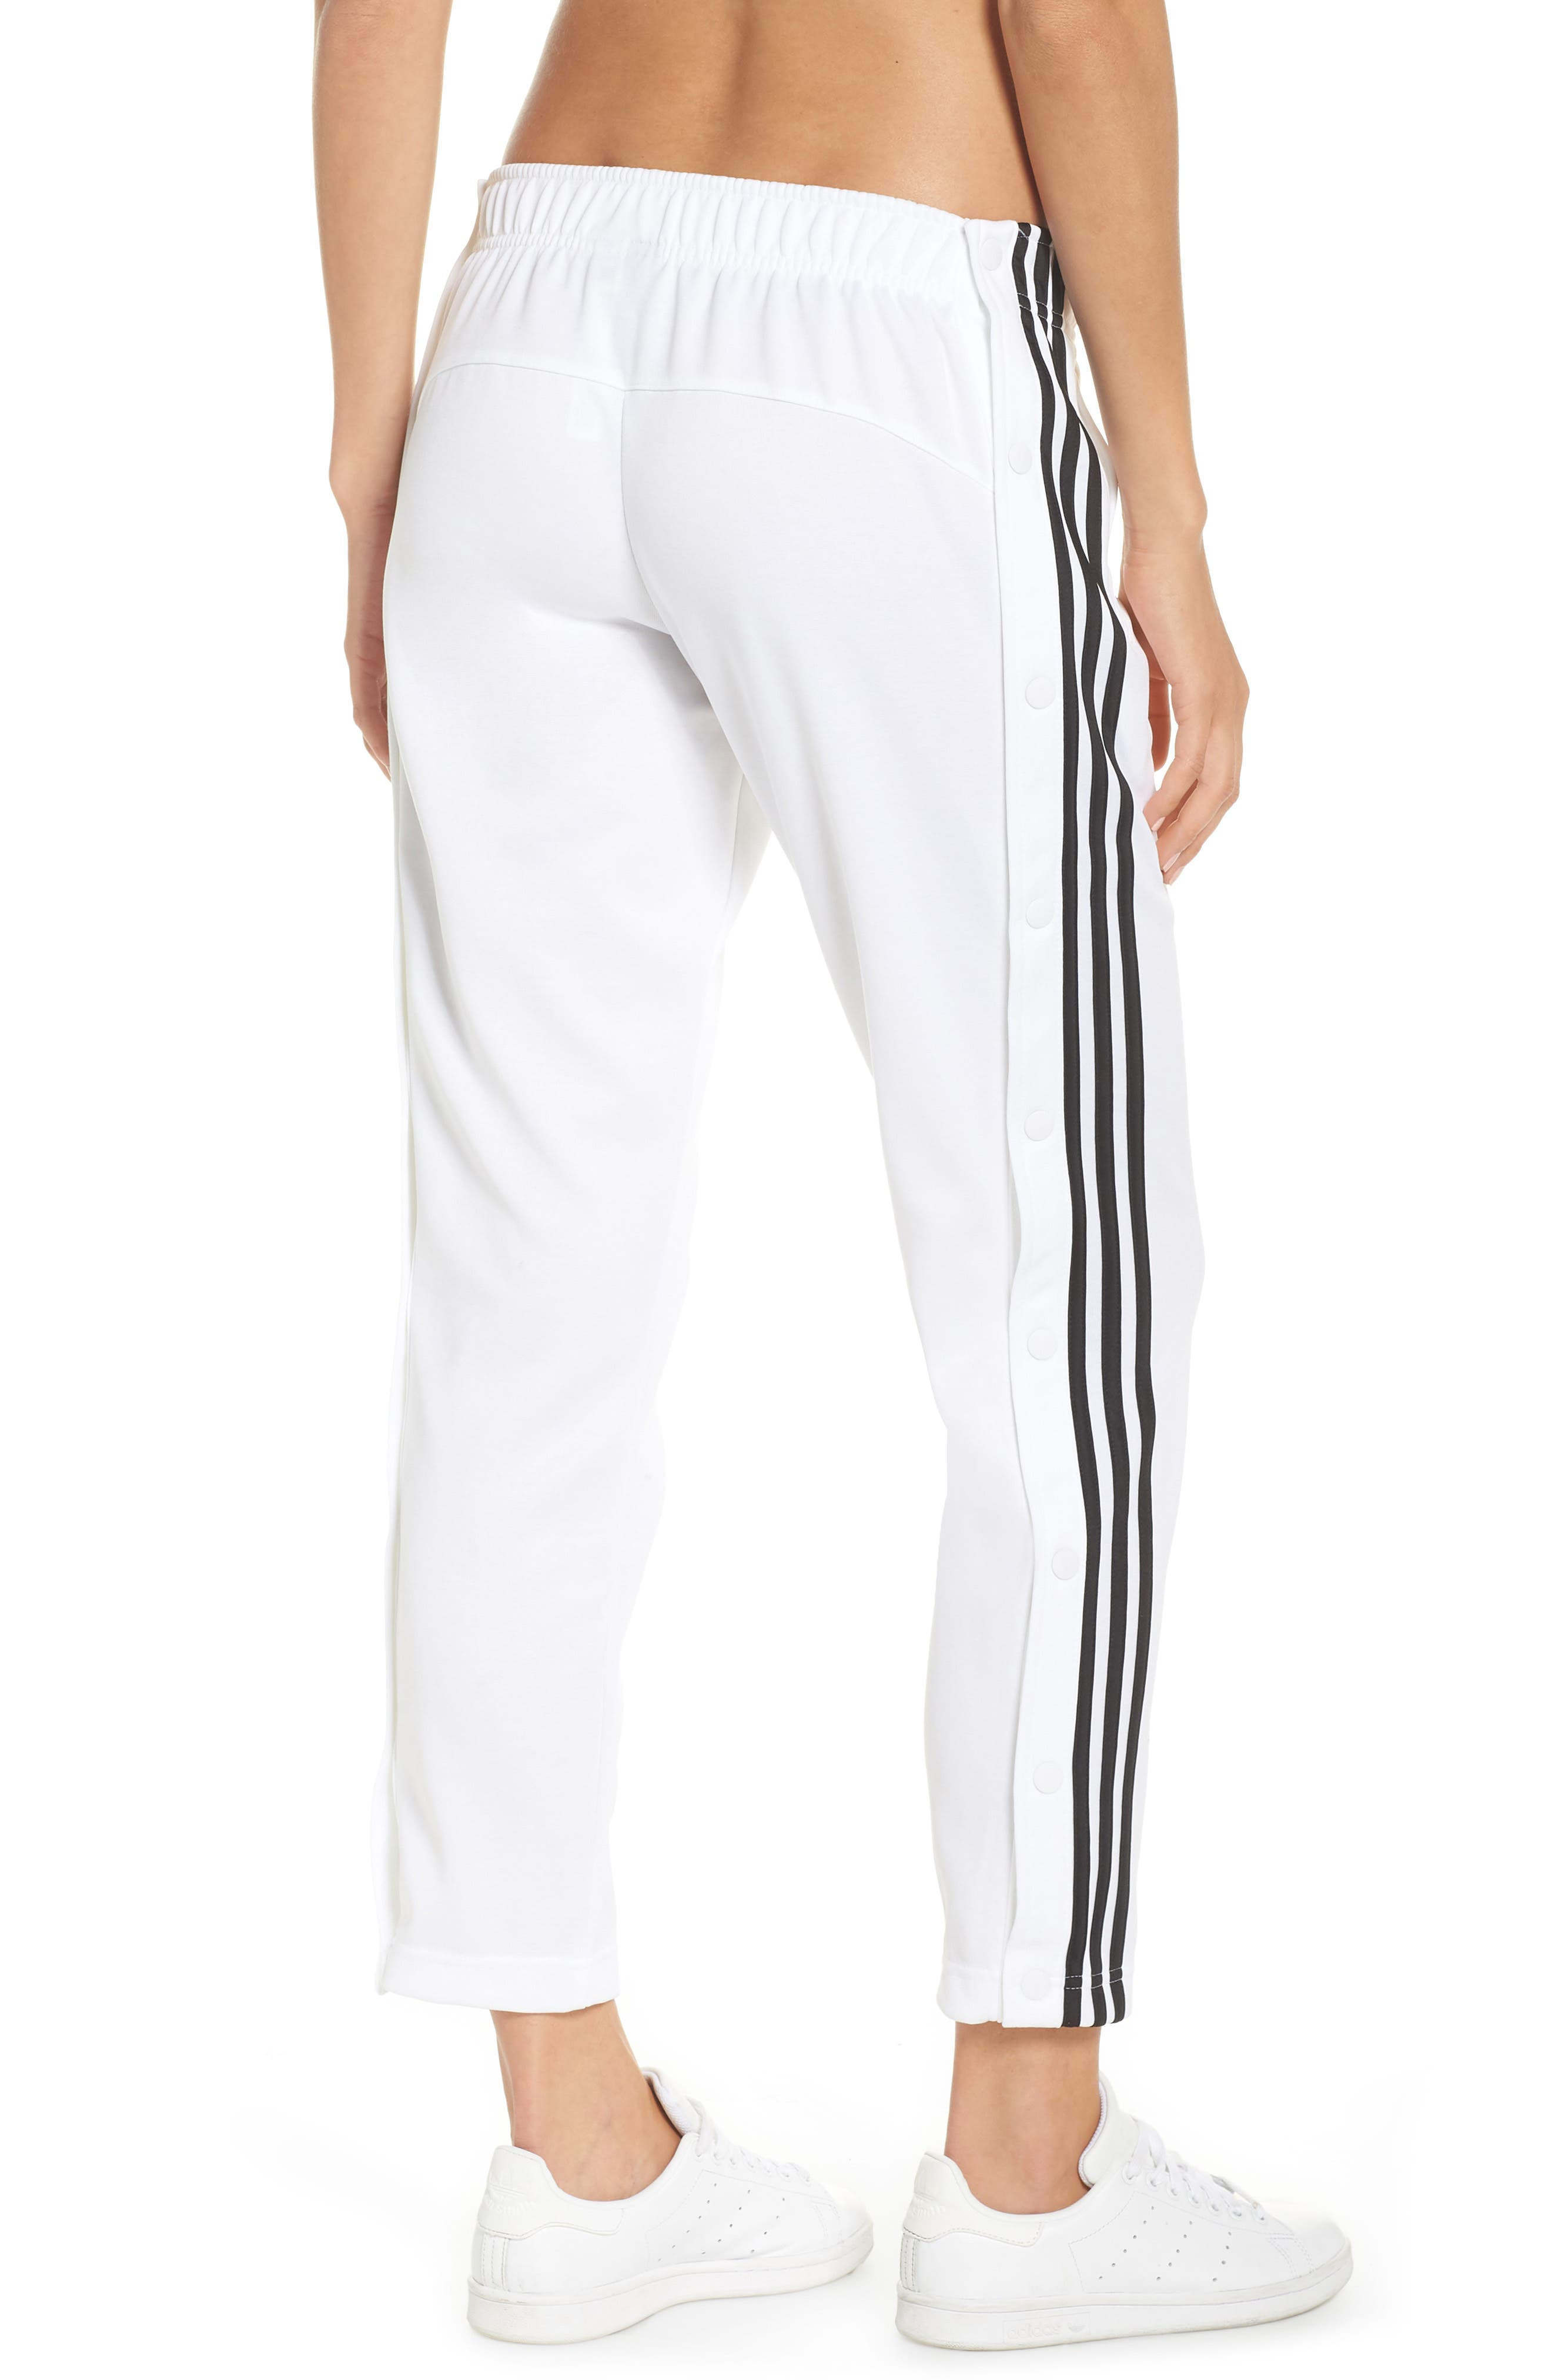 Tricot Snap Pants,                             Alternate thumbnail 2, color,                             White/ Black/ Black